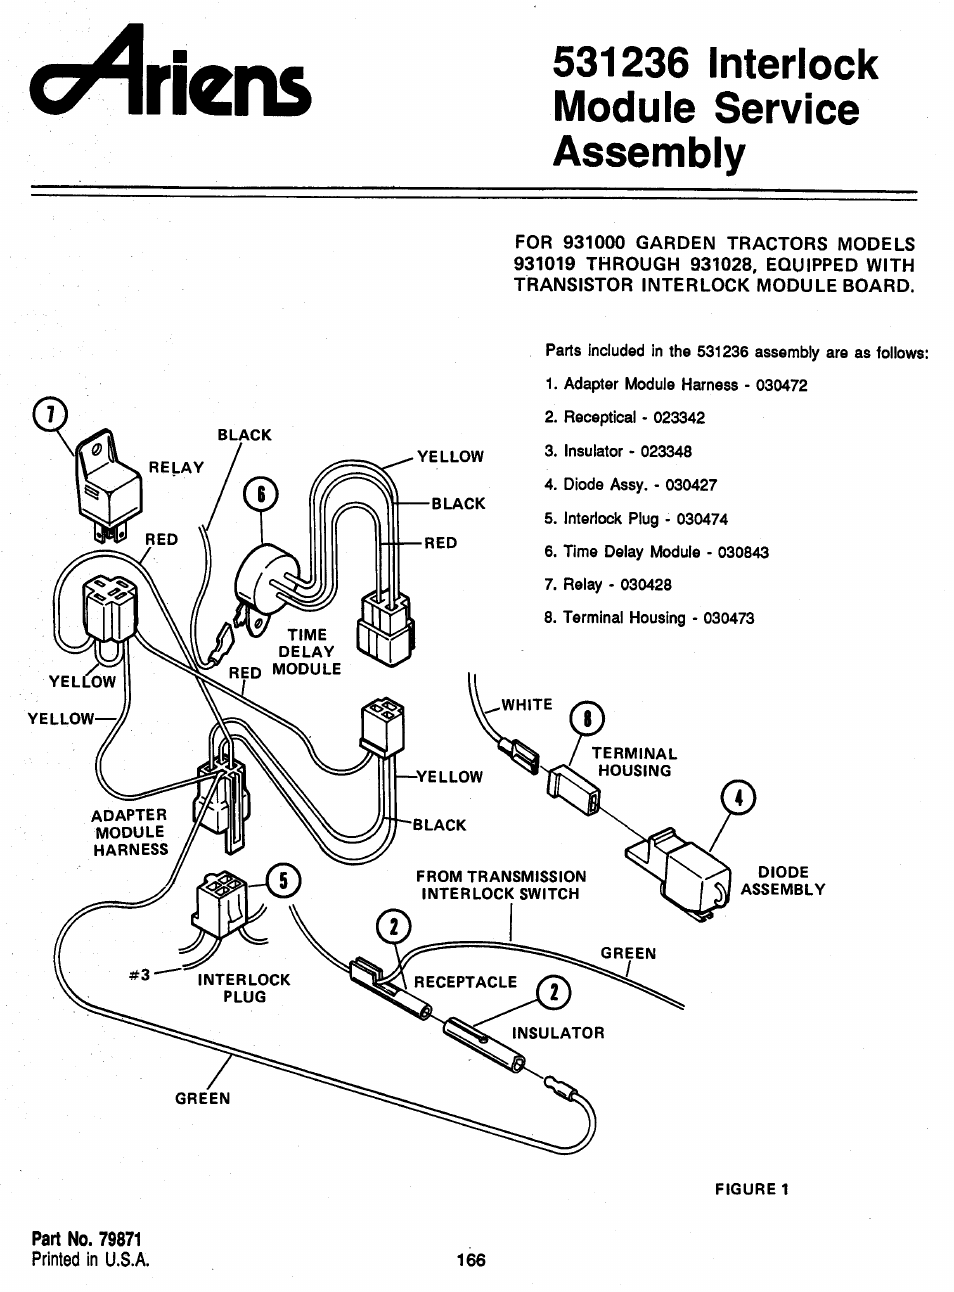 531236 interlock module service assembly, Ariens | Ariens 931 User Manual |  Page 167 / 167